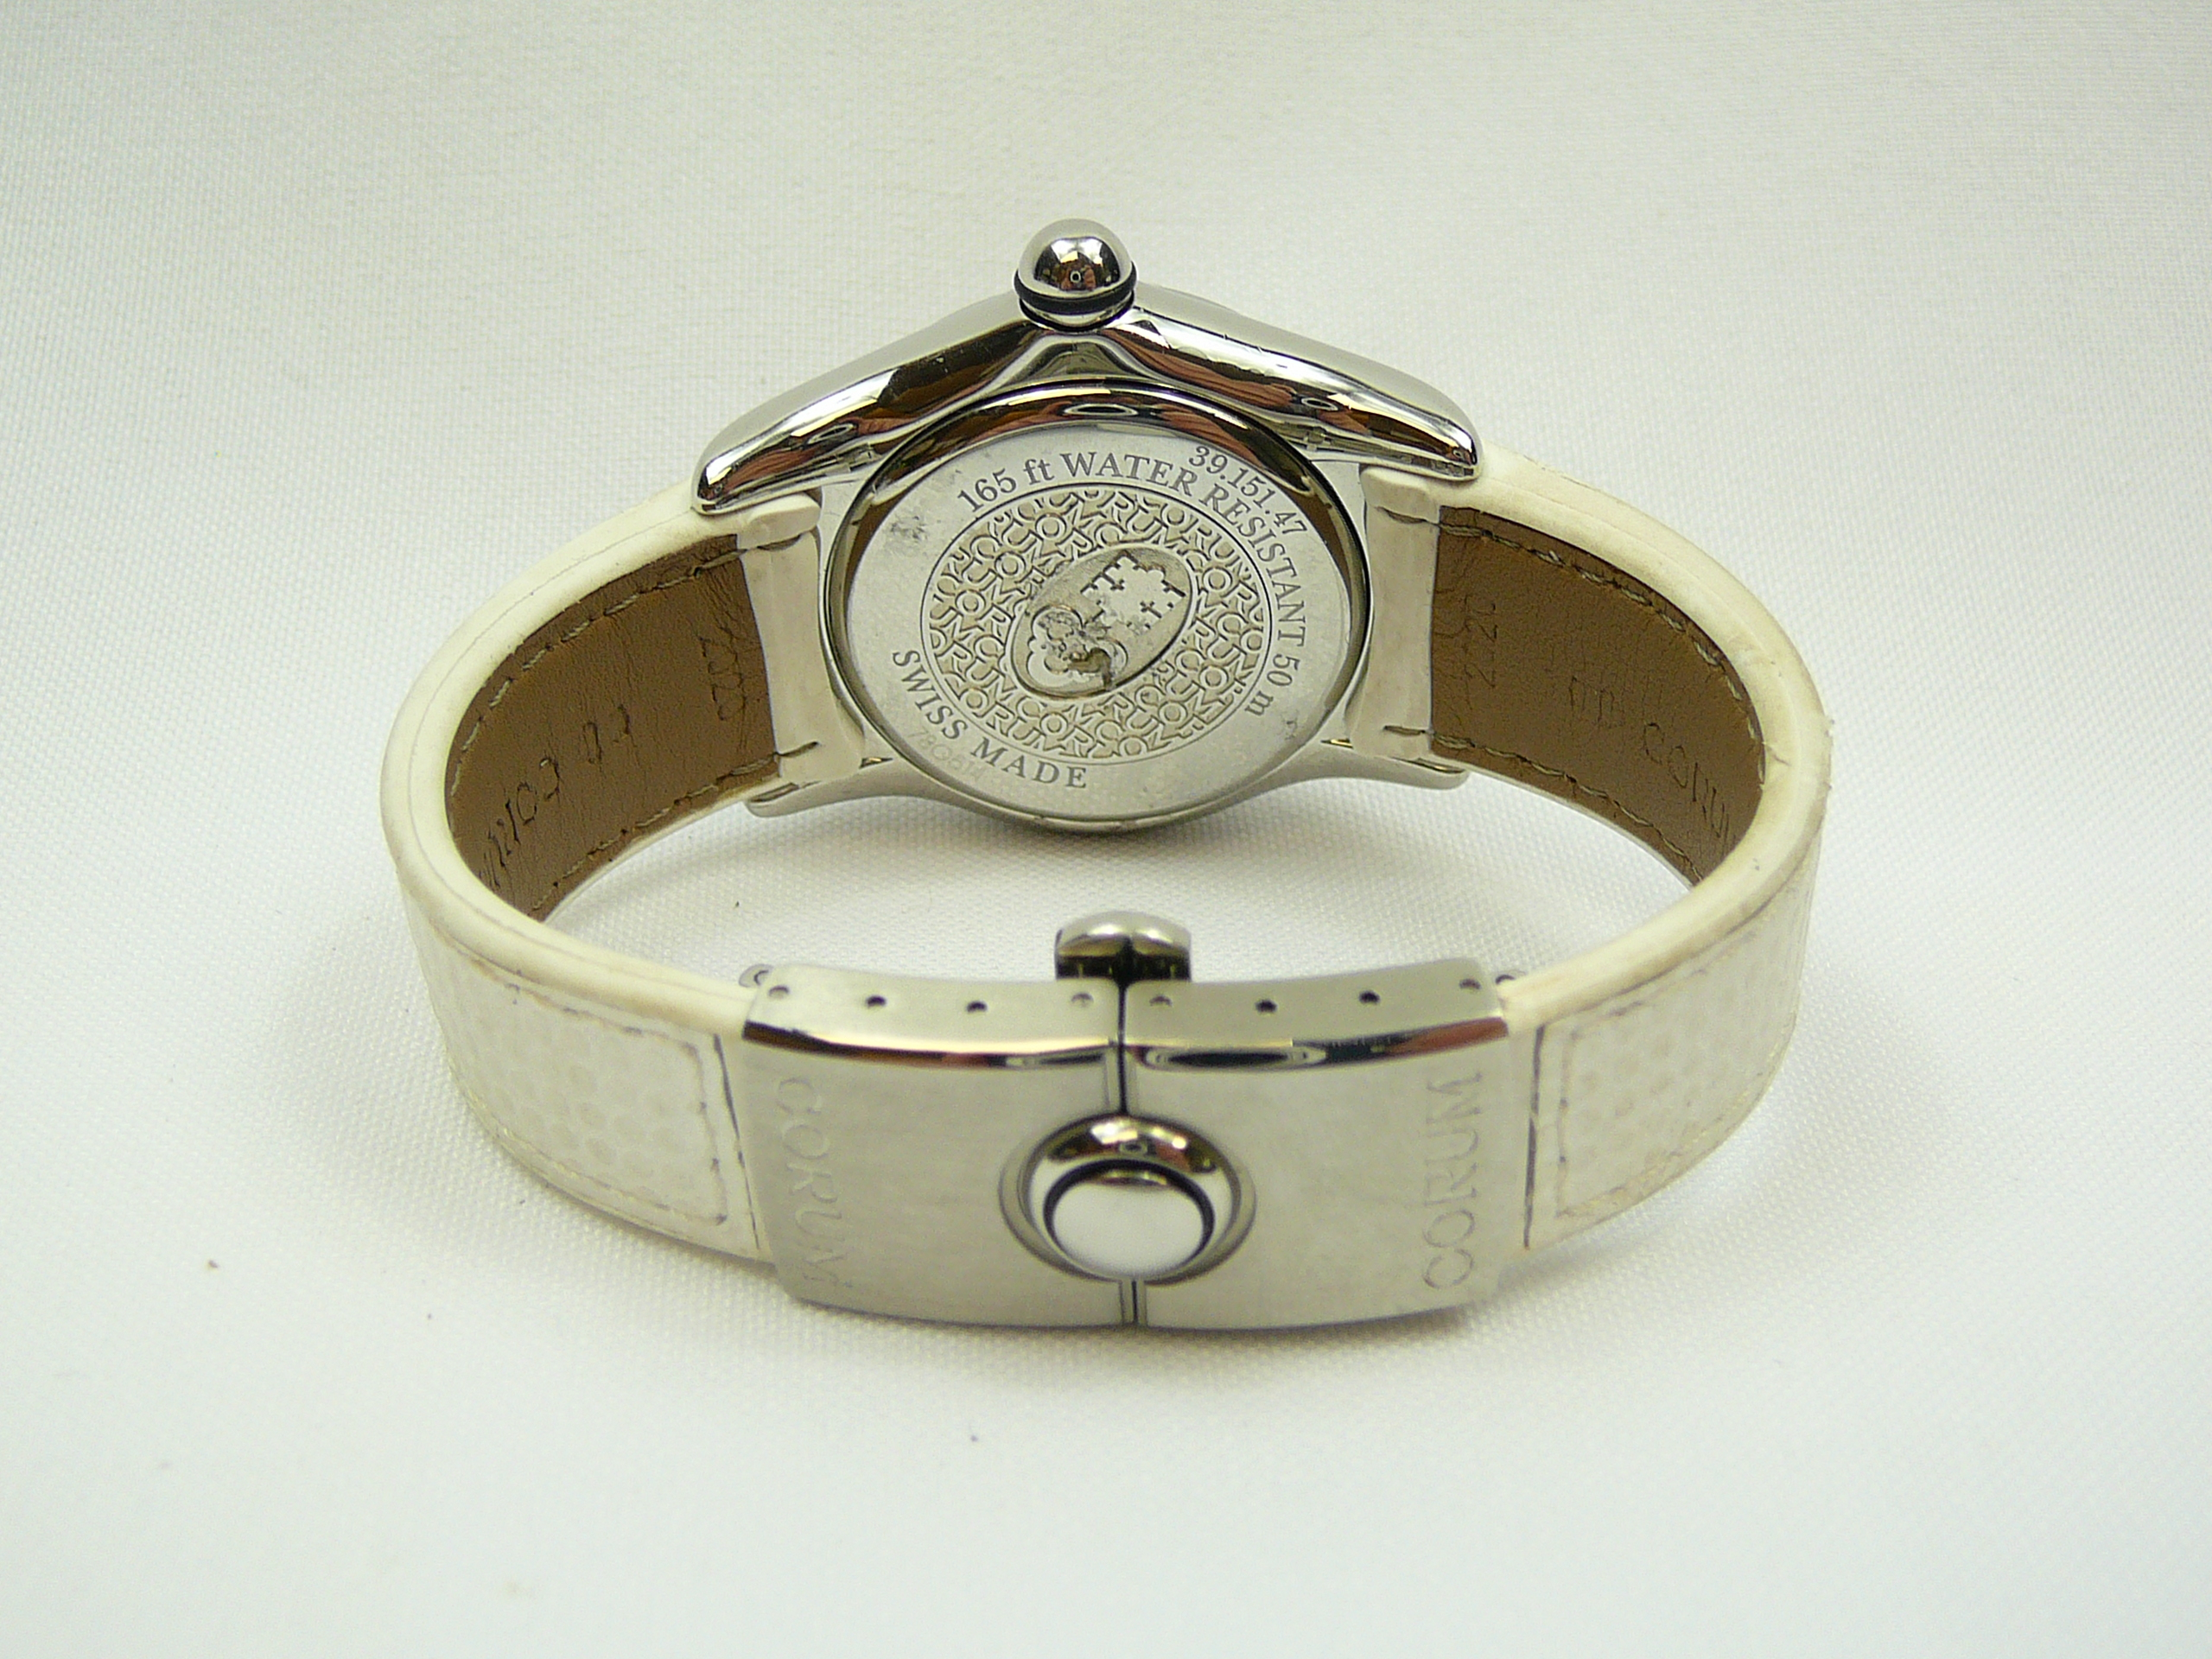 Ladies Corum Wrist Watch - Image 3 of 3